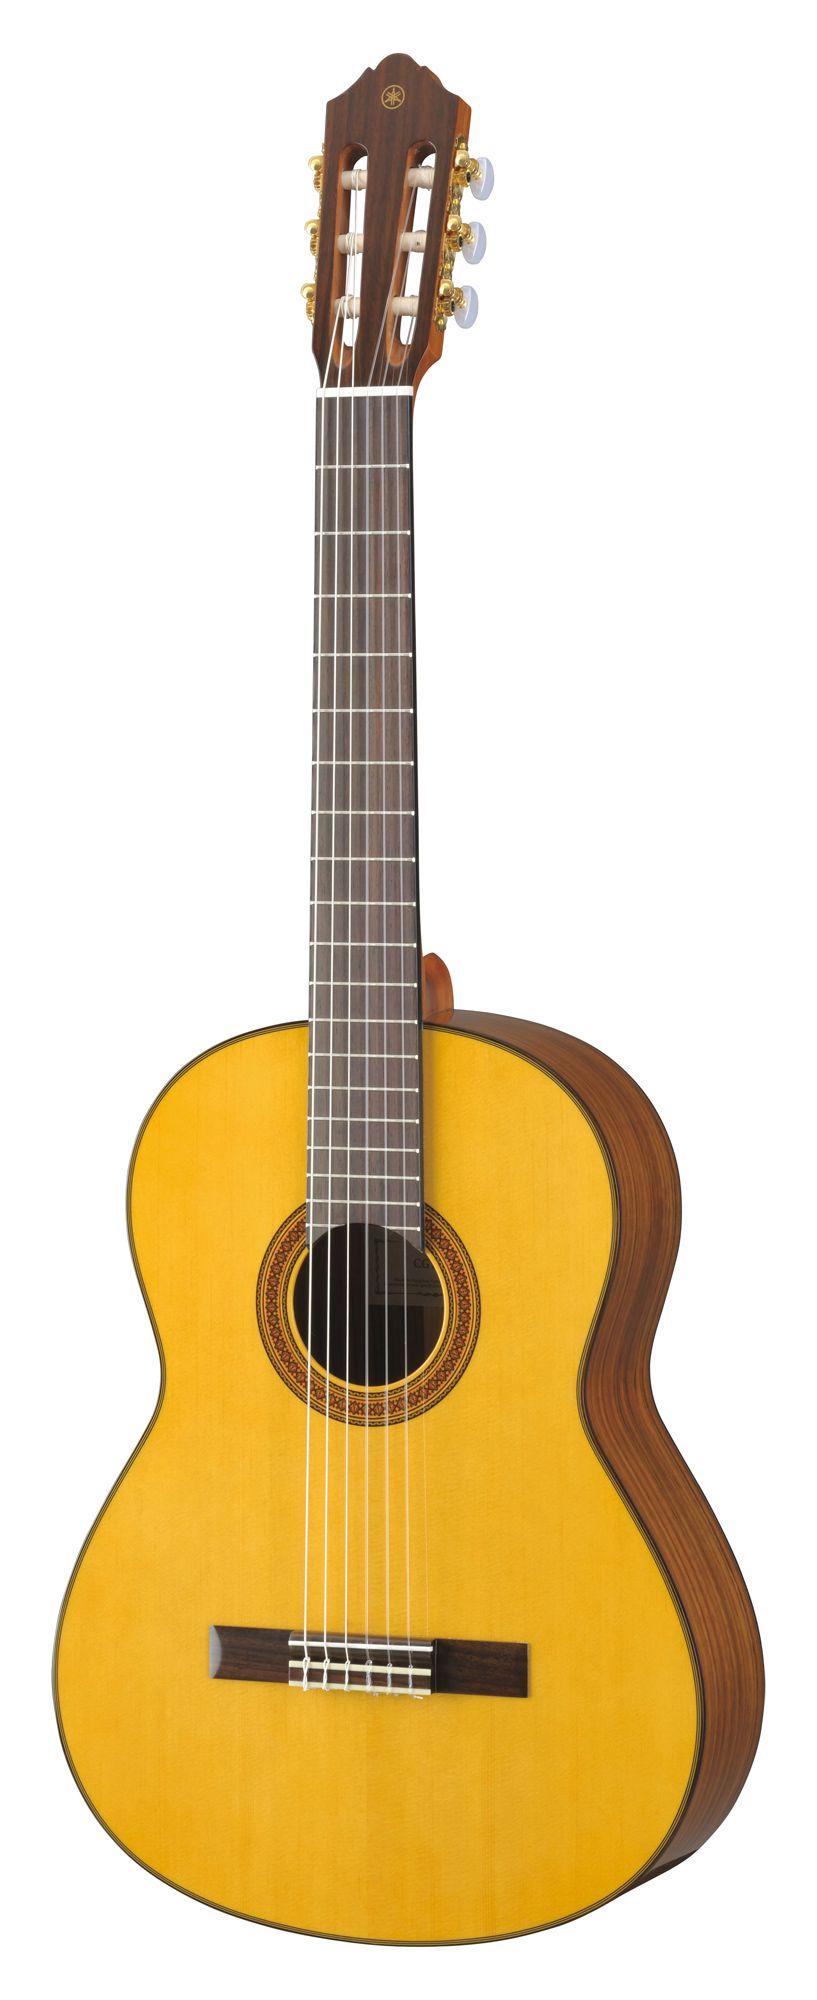 Violão Yamaha CG162S - Natural